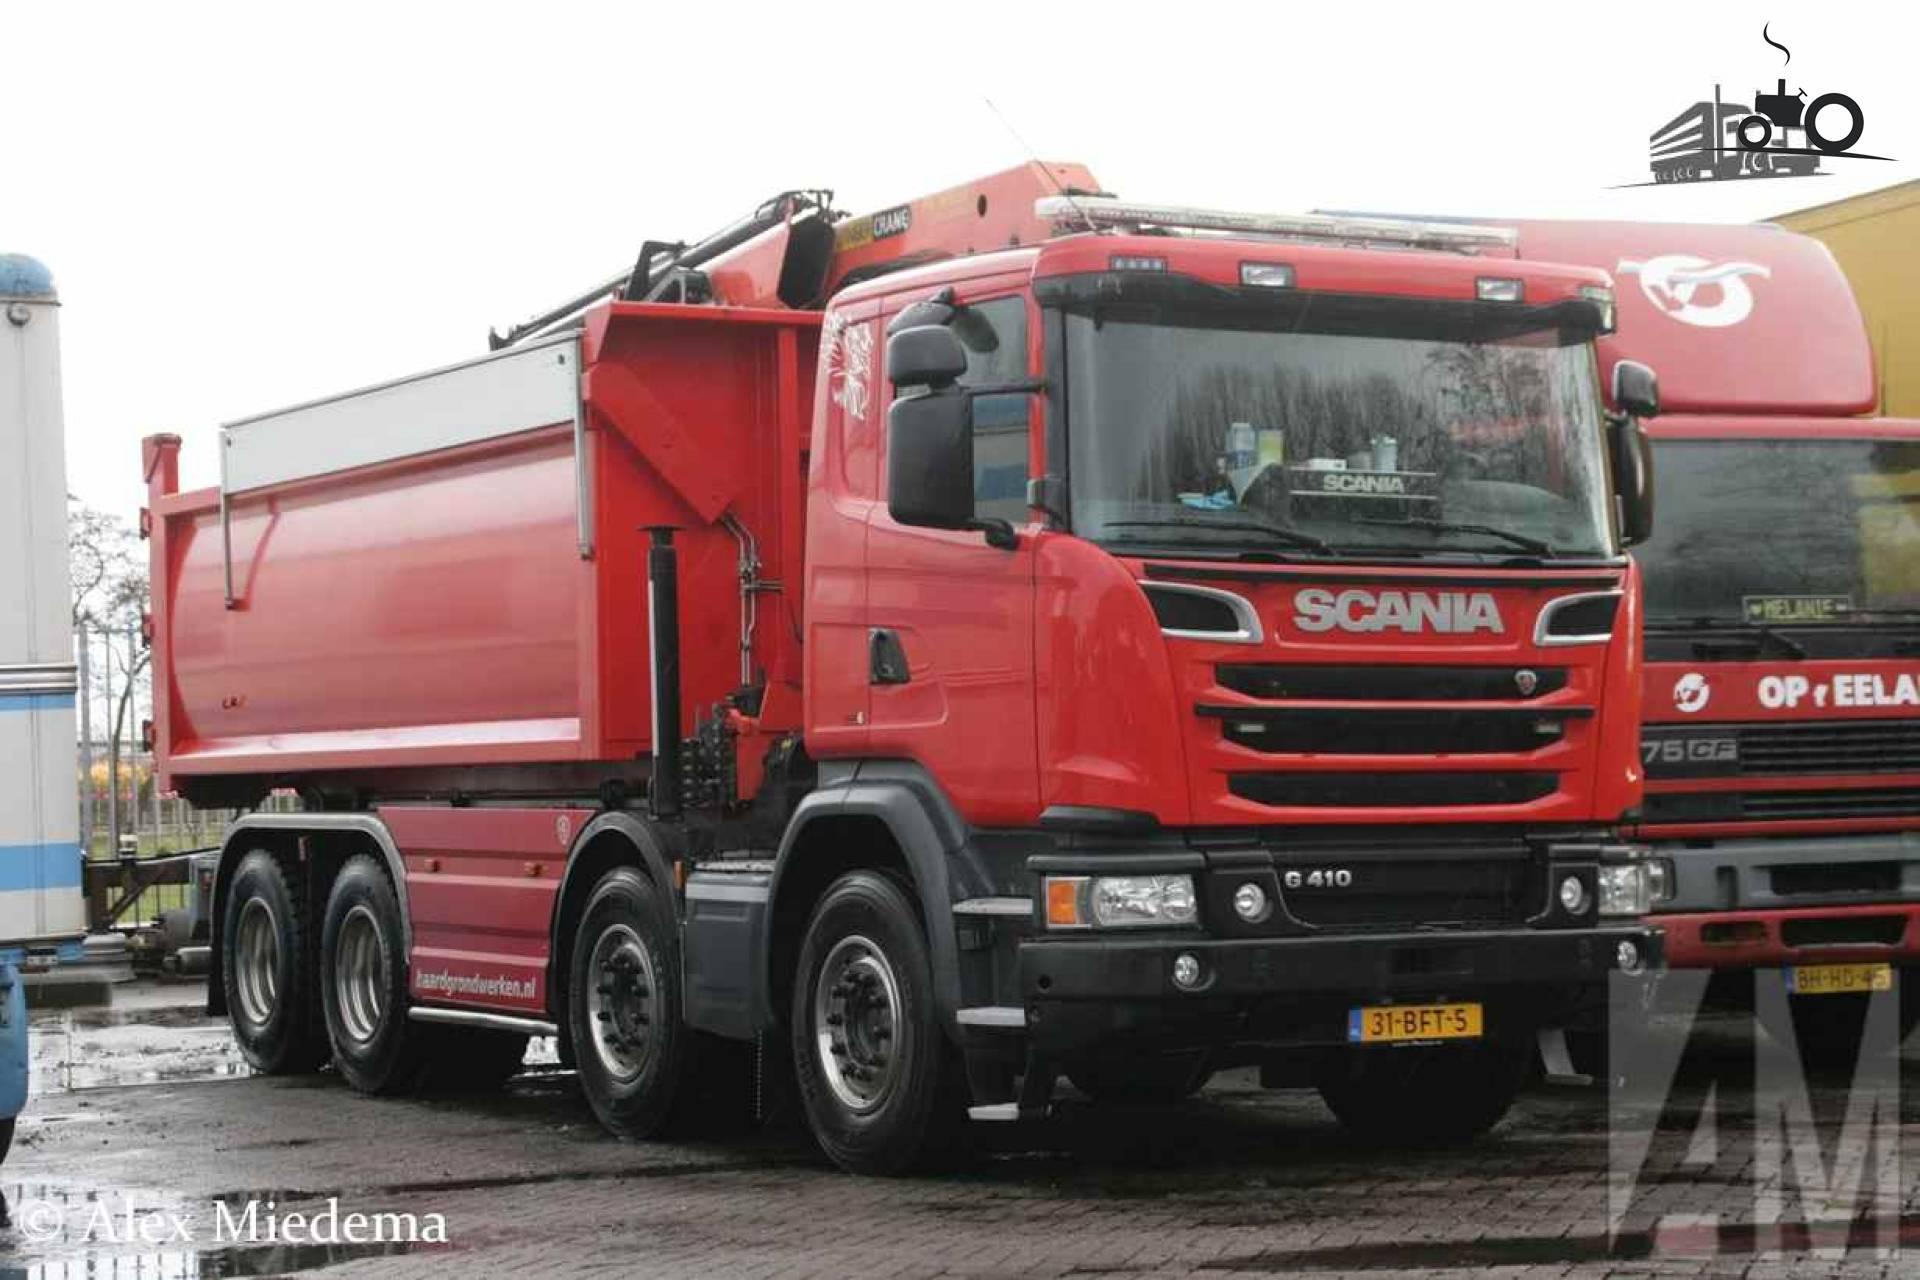 Scania G410